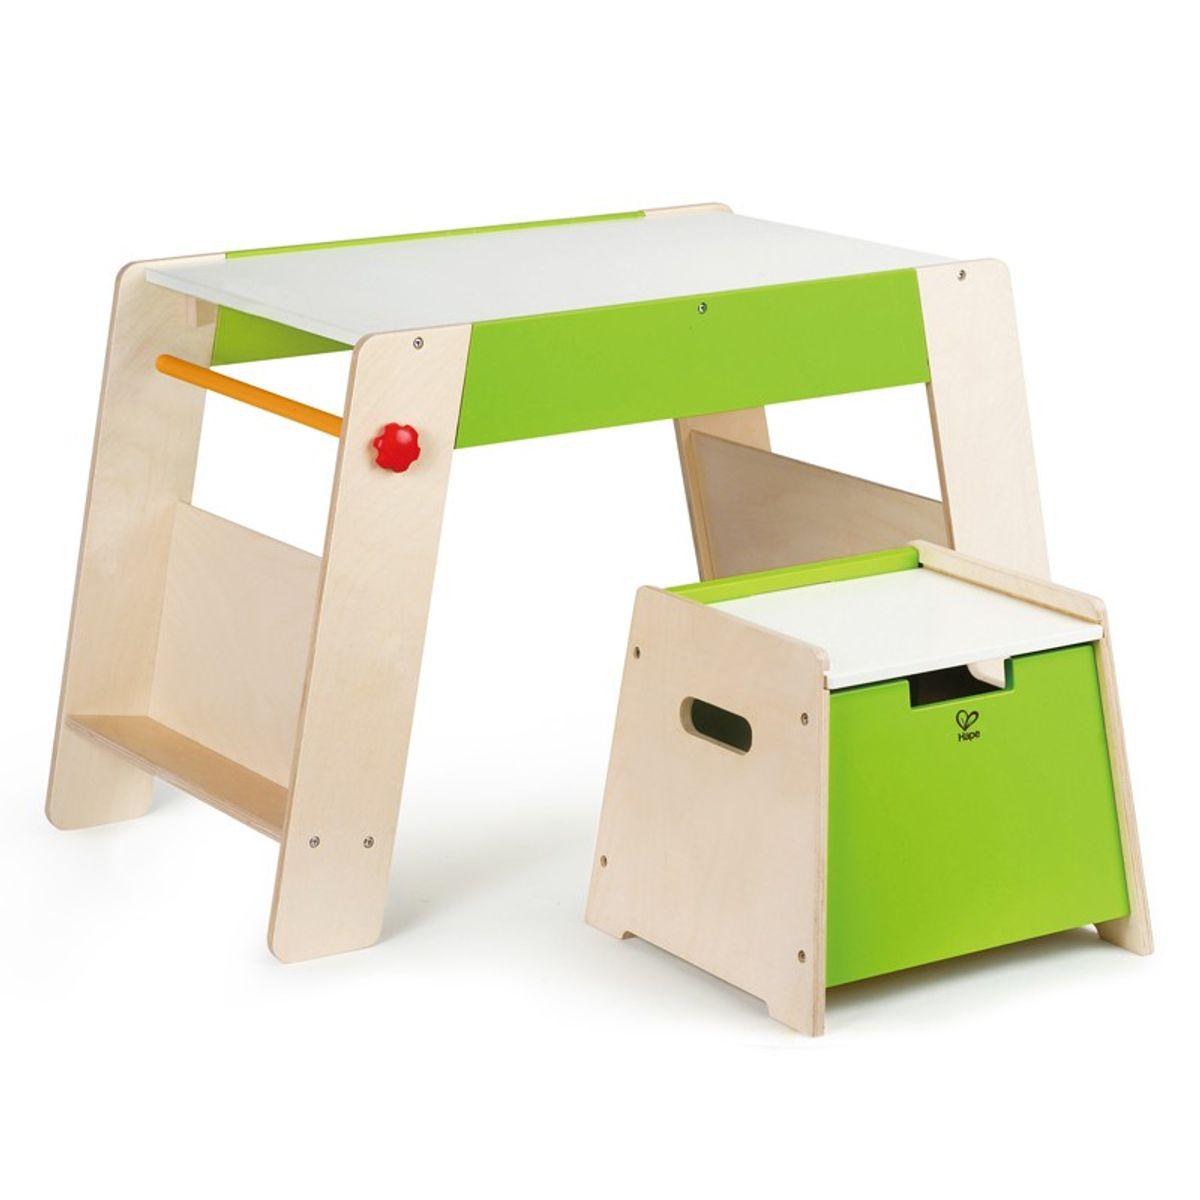 Erste Sitzgruppe Kindersitzgruppe Kindermöbel Holz Von Hape